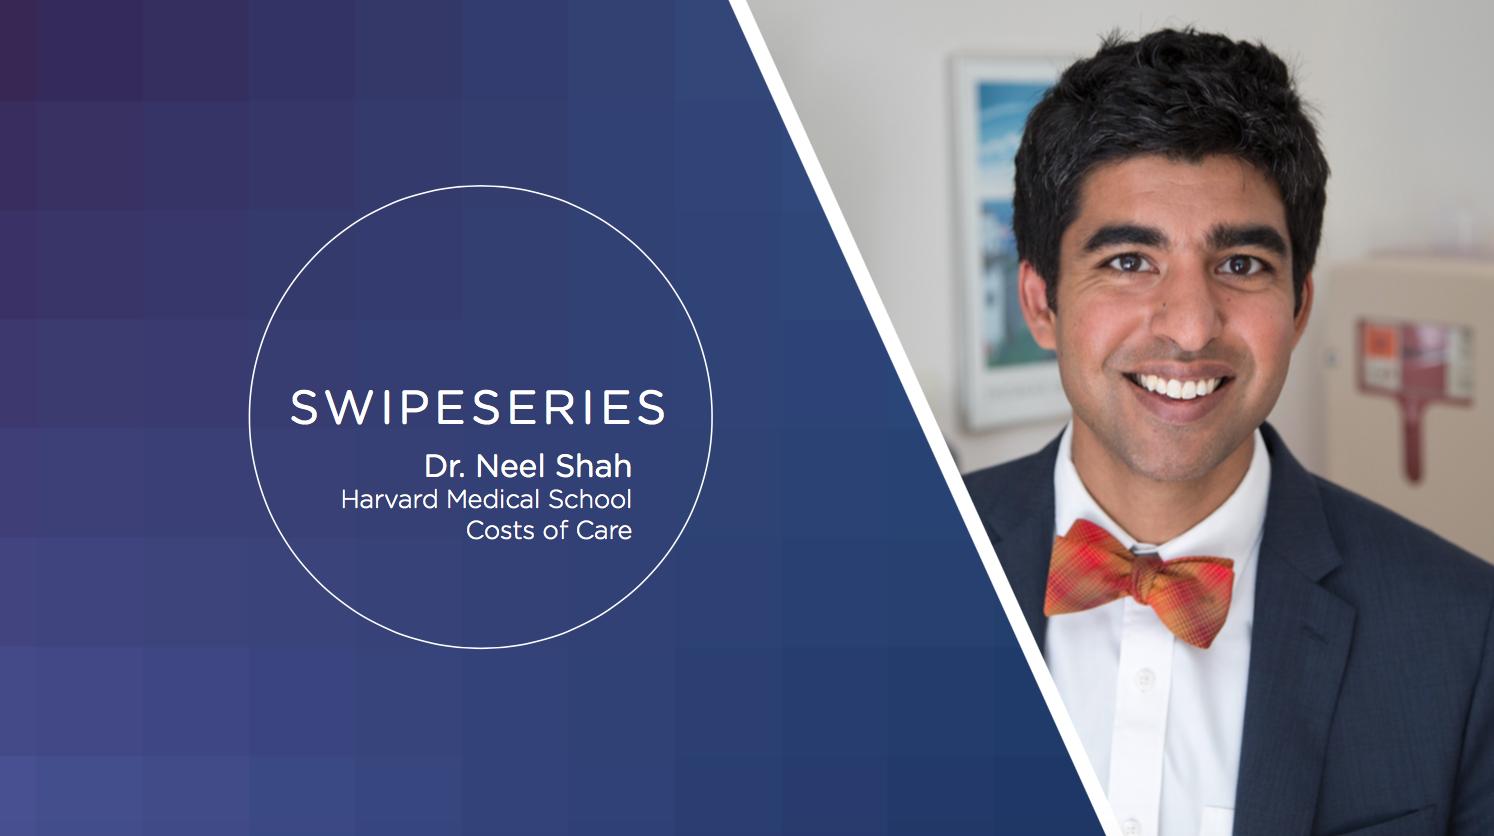 SwipeSeries Interview: Dr. Neel Shah